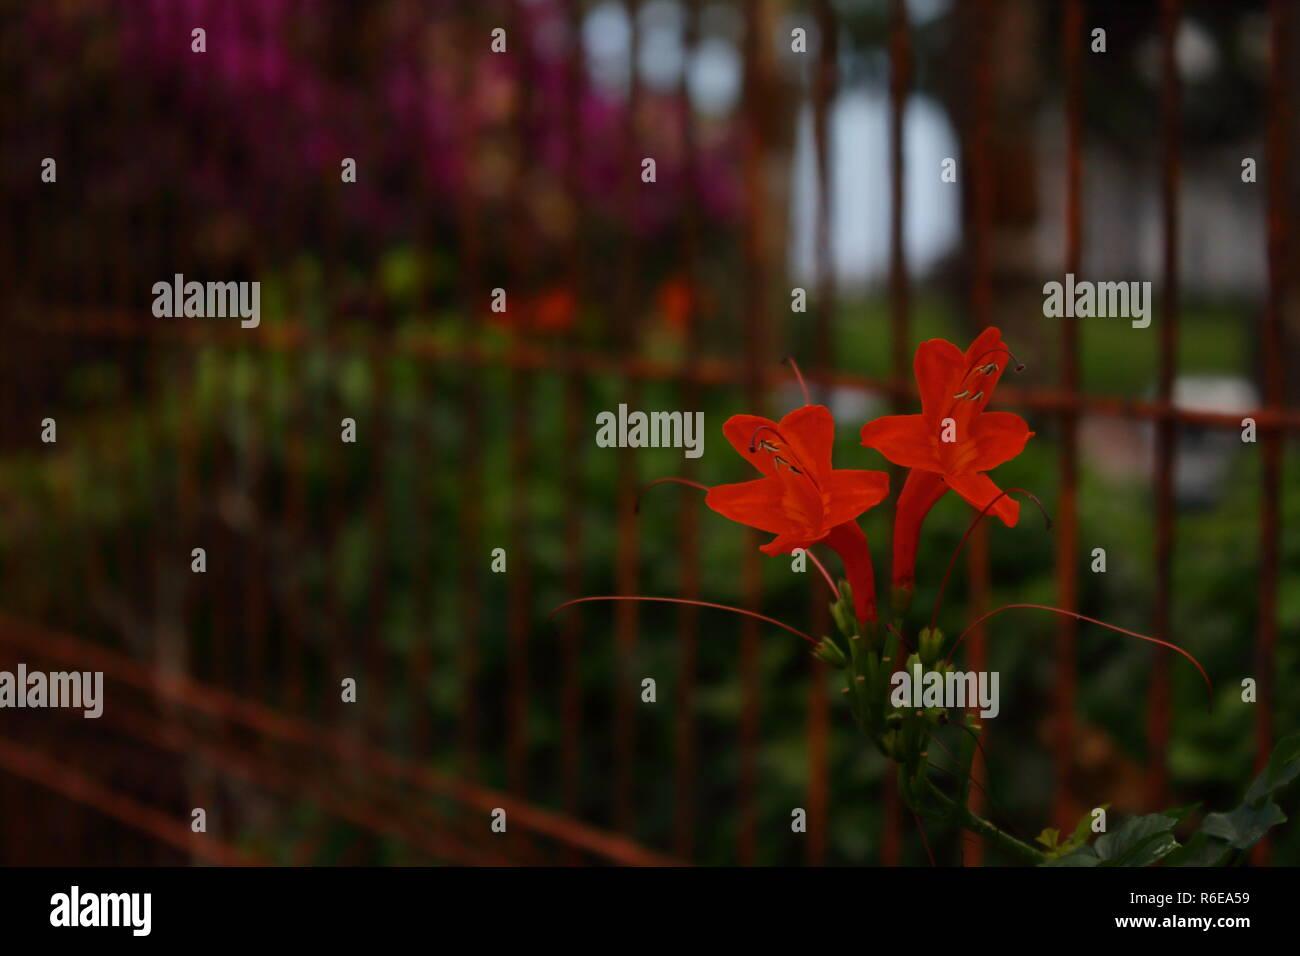 Red flower between bars. Flor roja entre las rejas - Stock Image